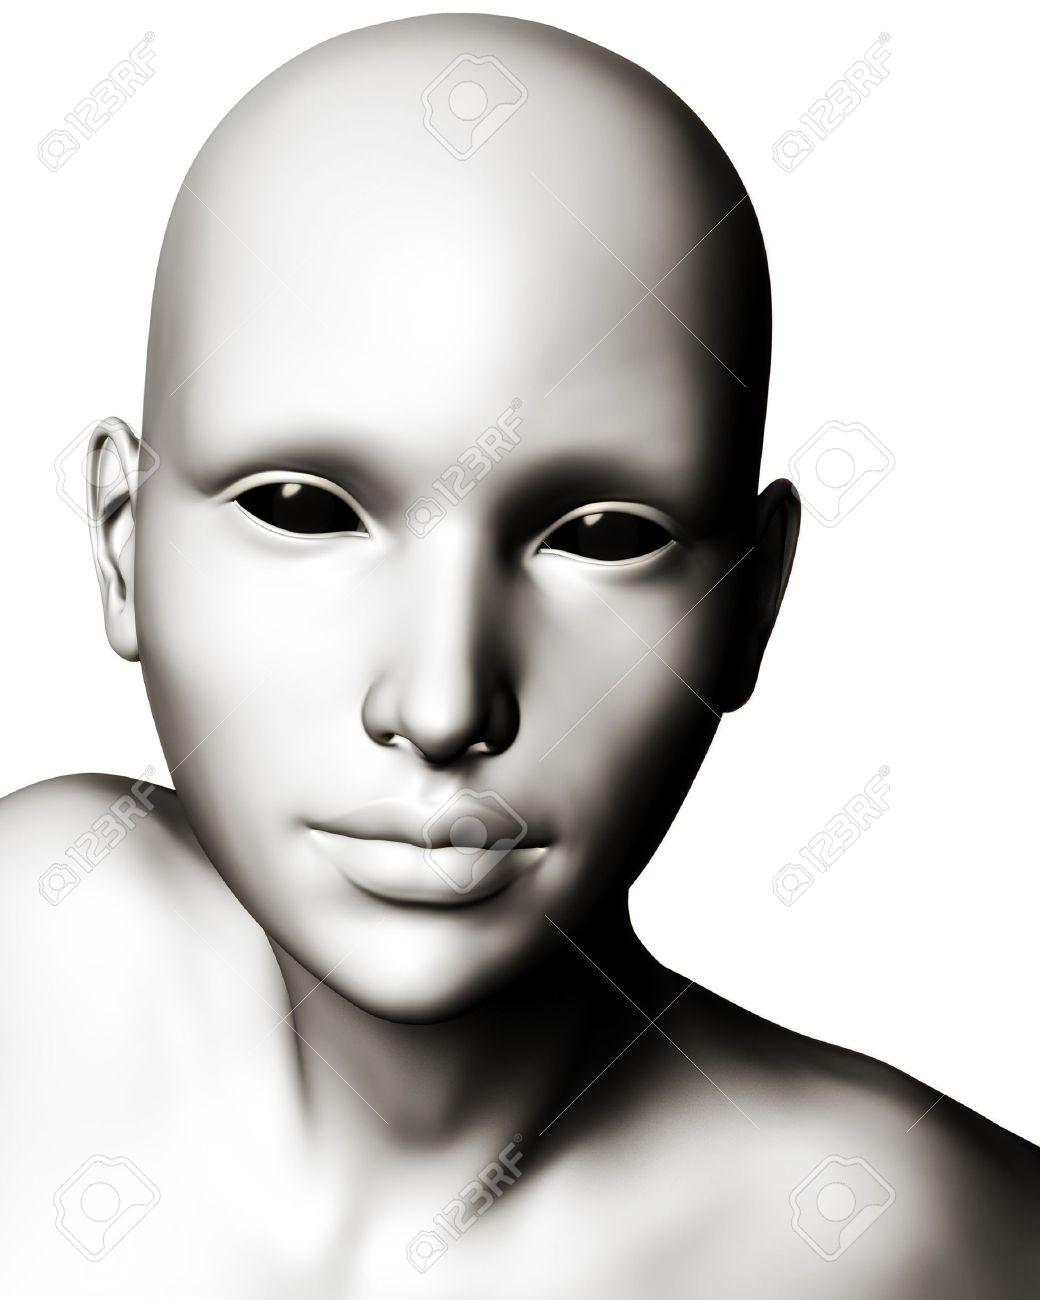 Resultado de imagen de hairless humanoid